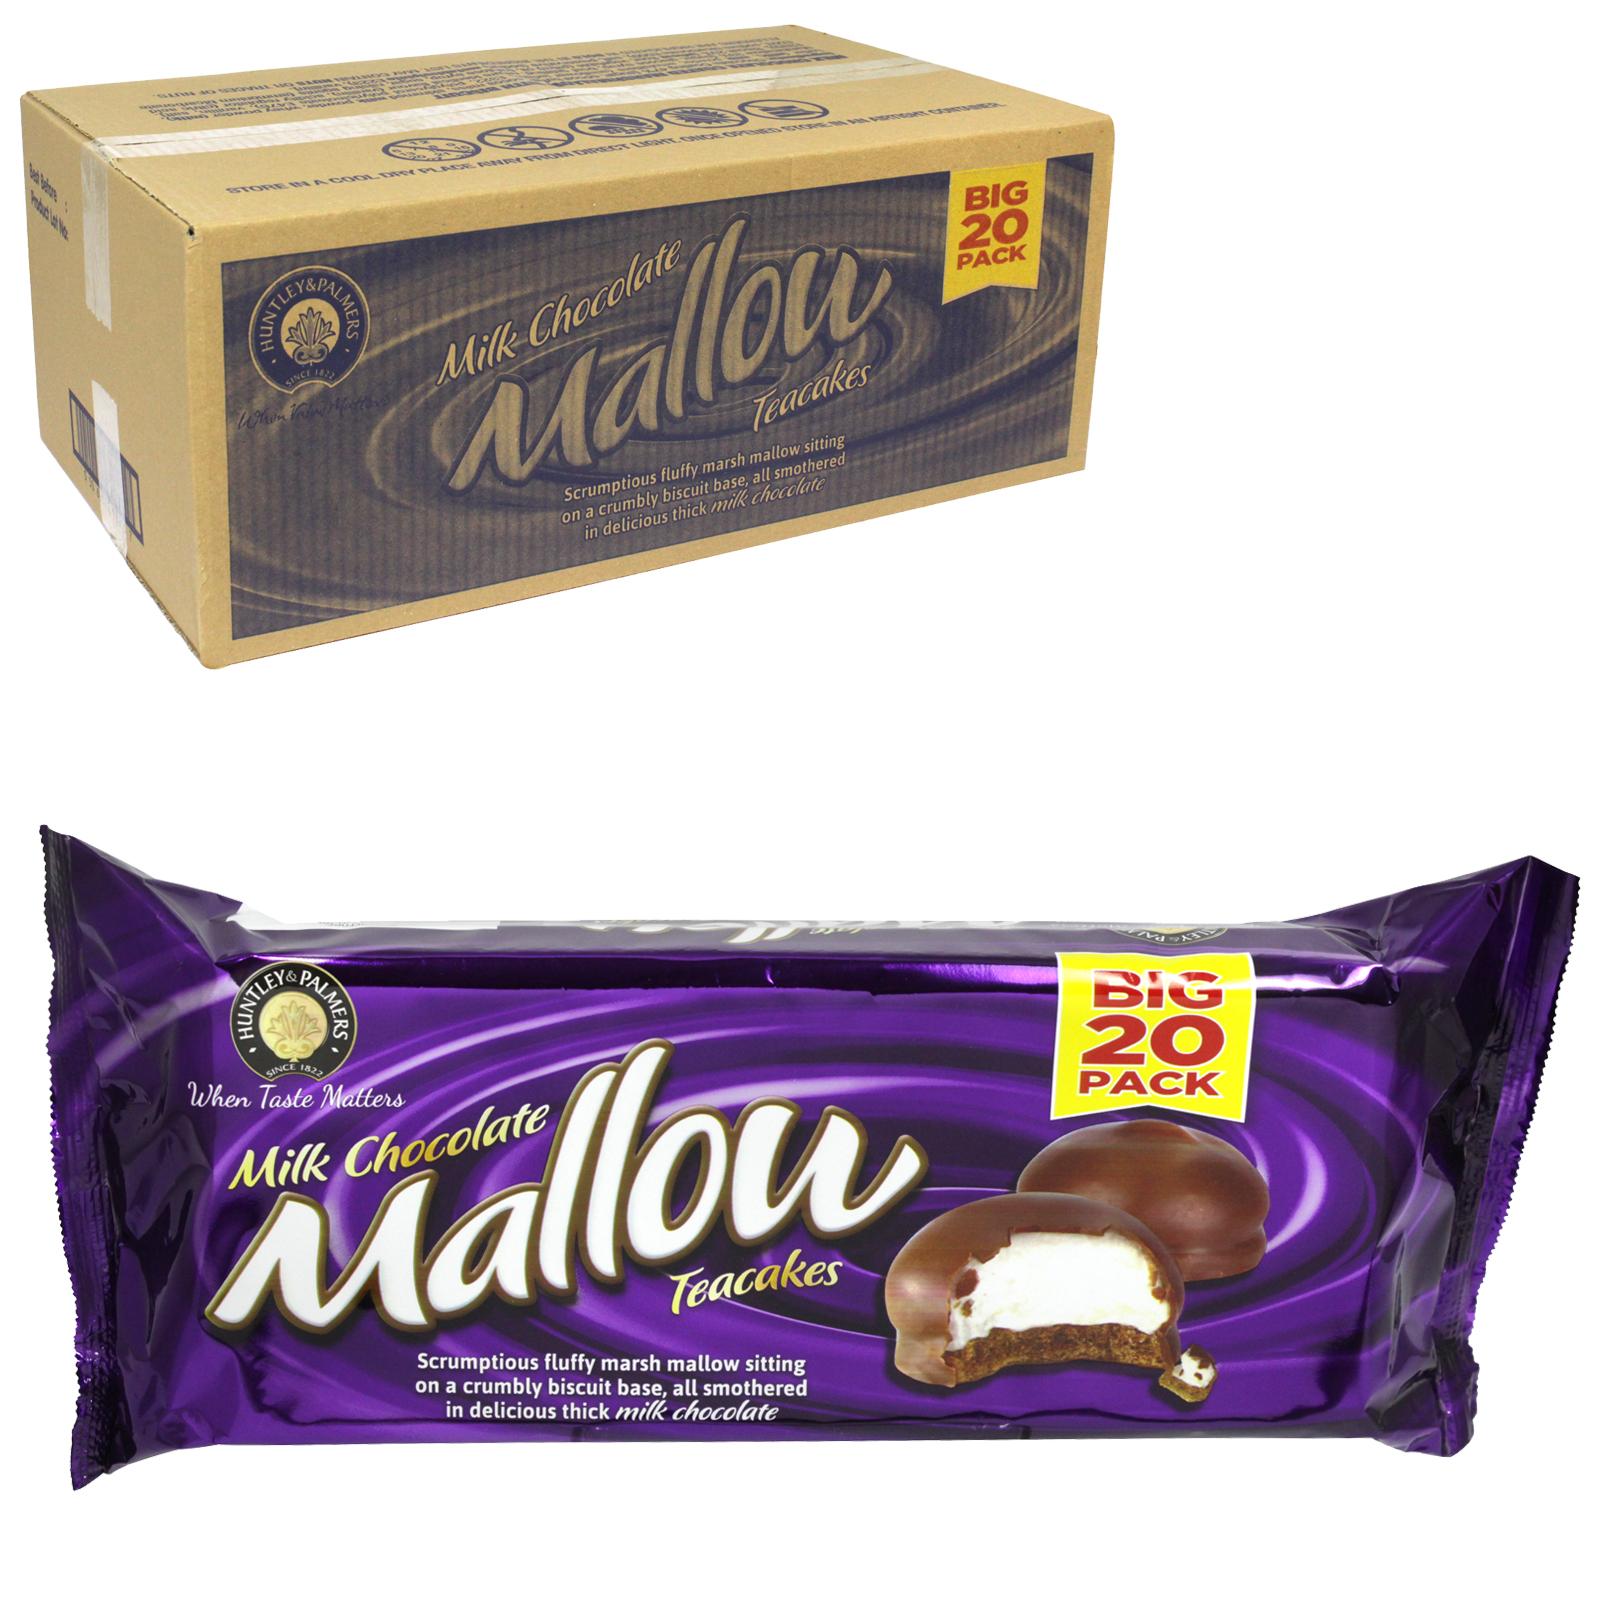 HUNTLEY & PALMER CHOCOLATE MALLOW TEA CAKES X12